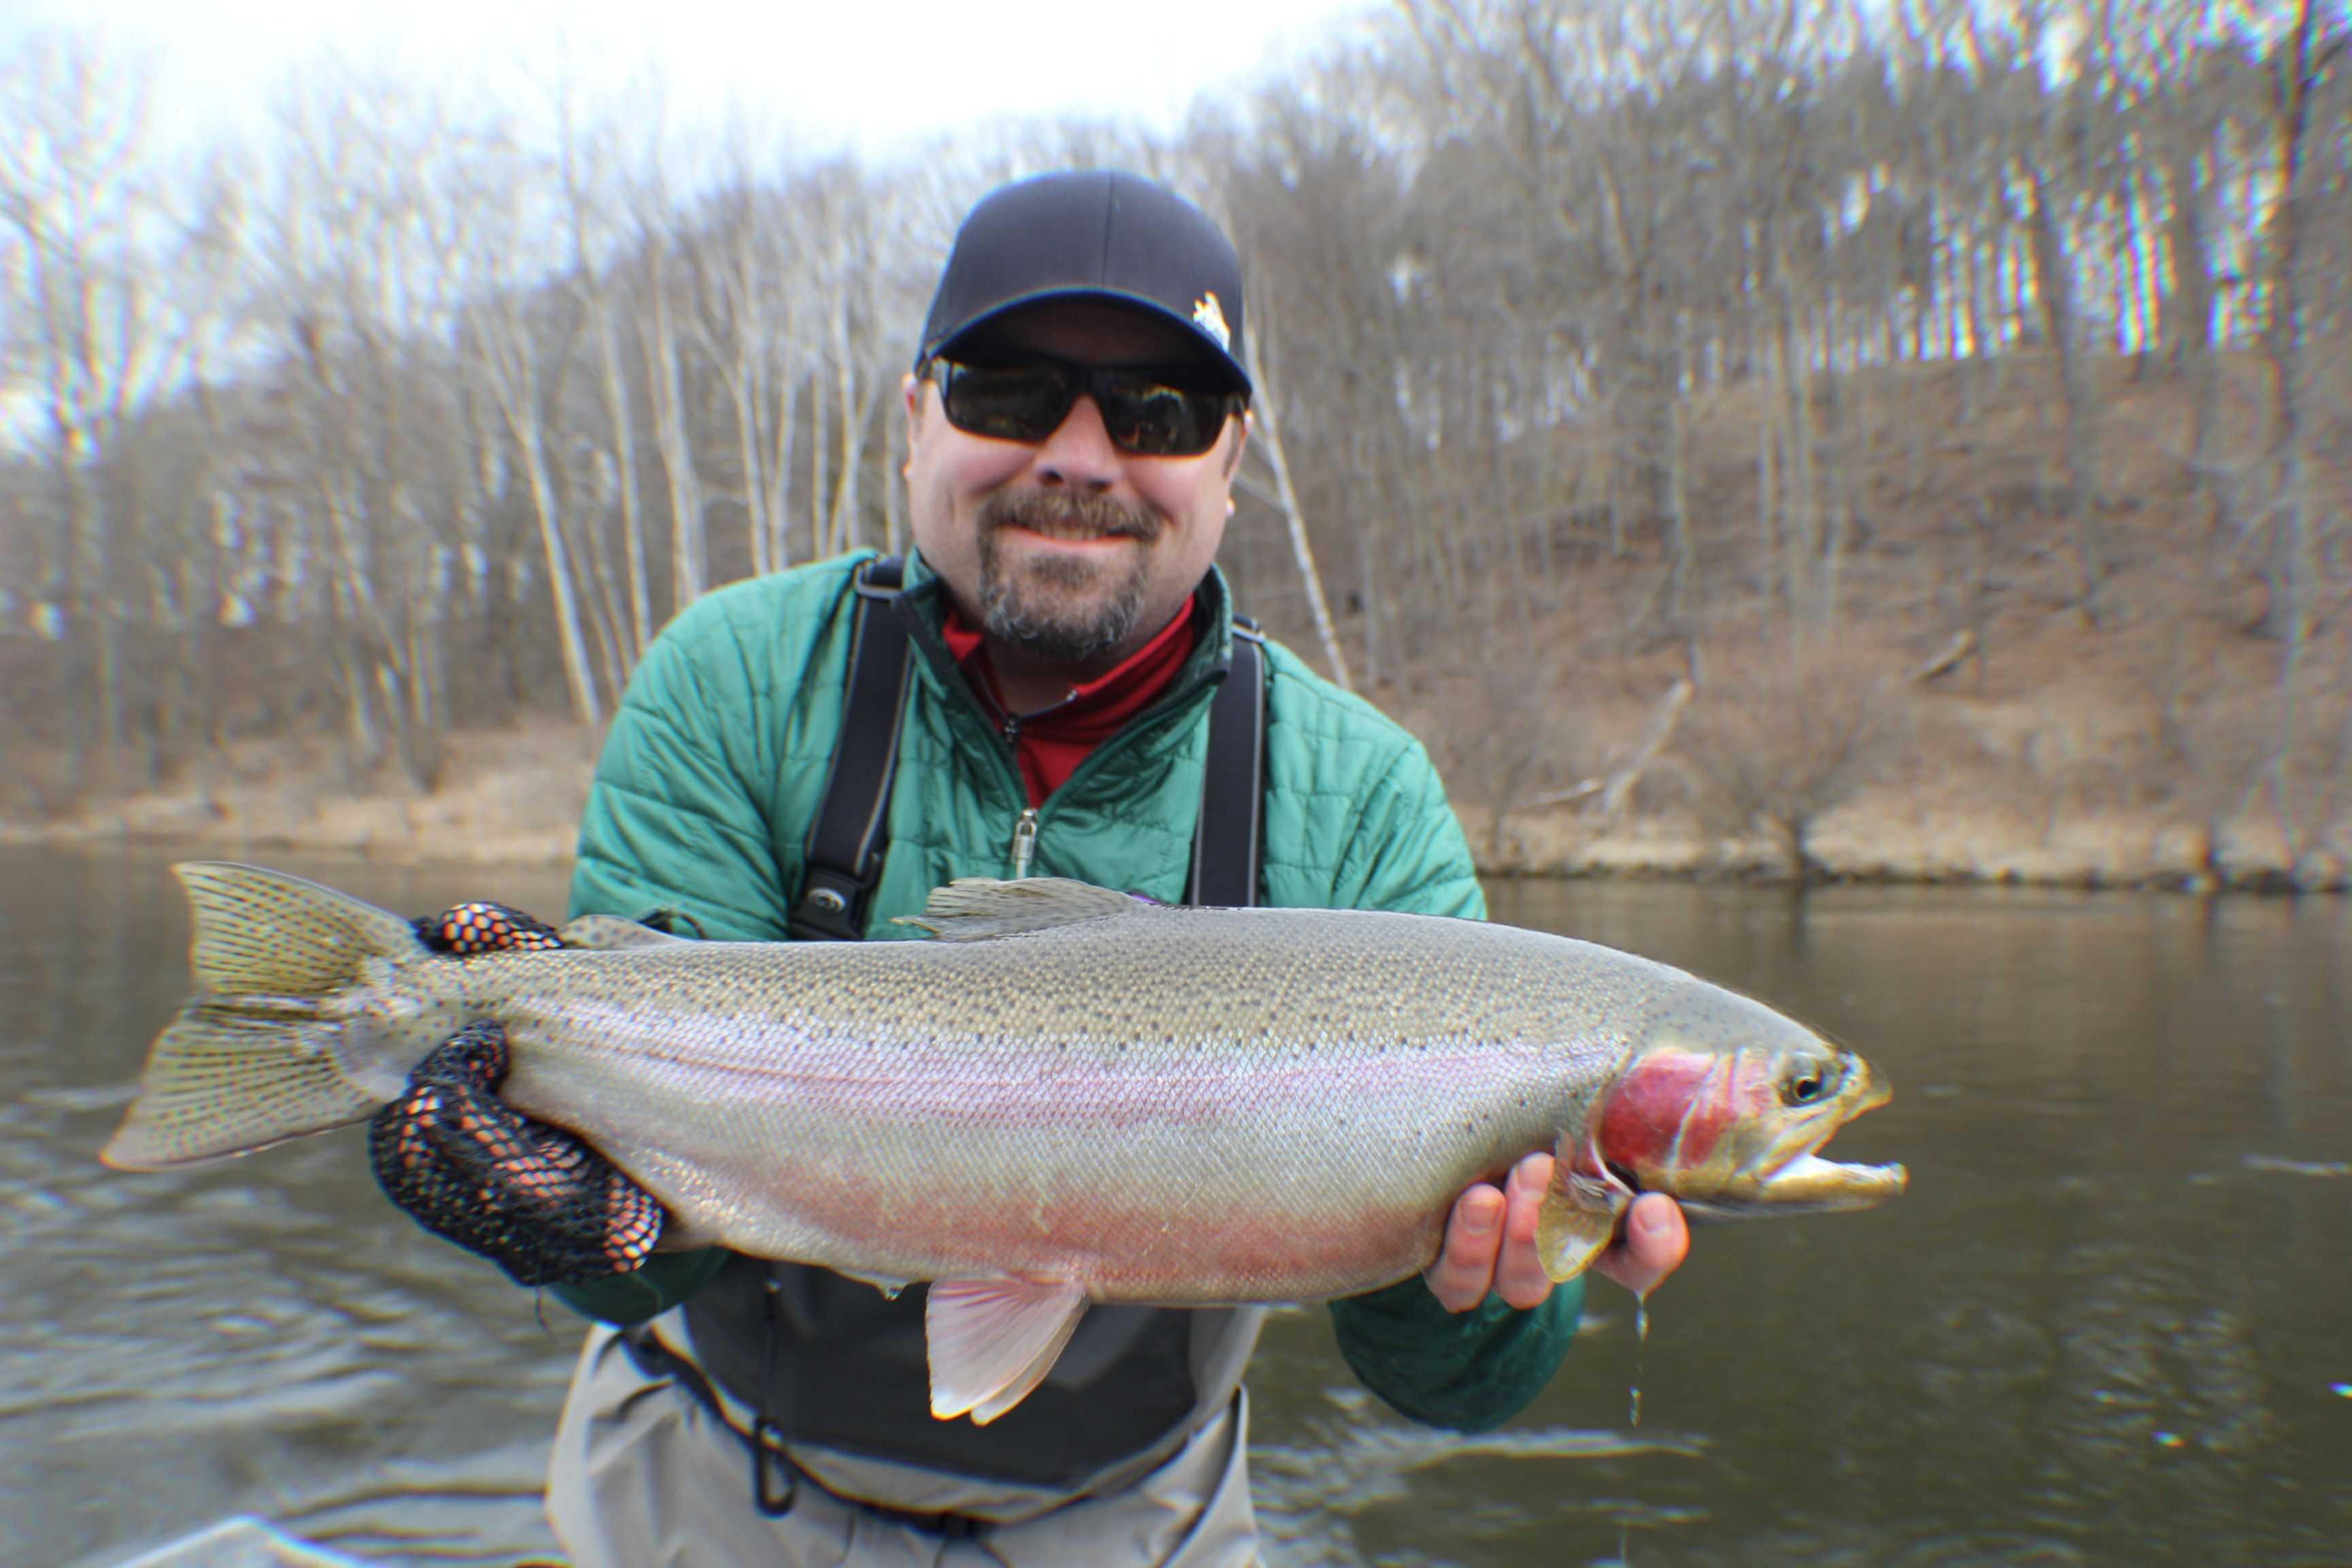 Muskegon river fishing report april 2016 coastal angler for Muskegon lake fishing report